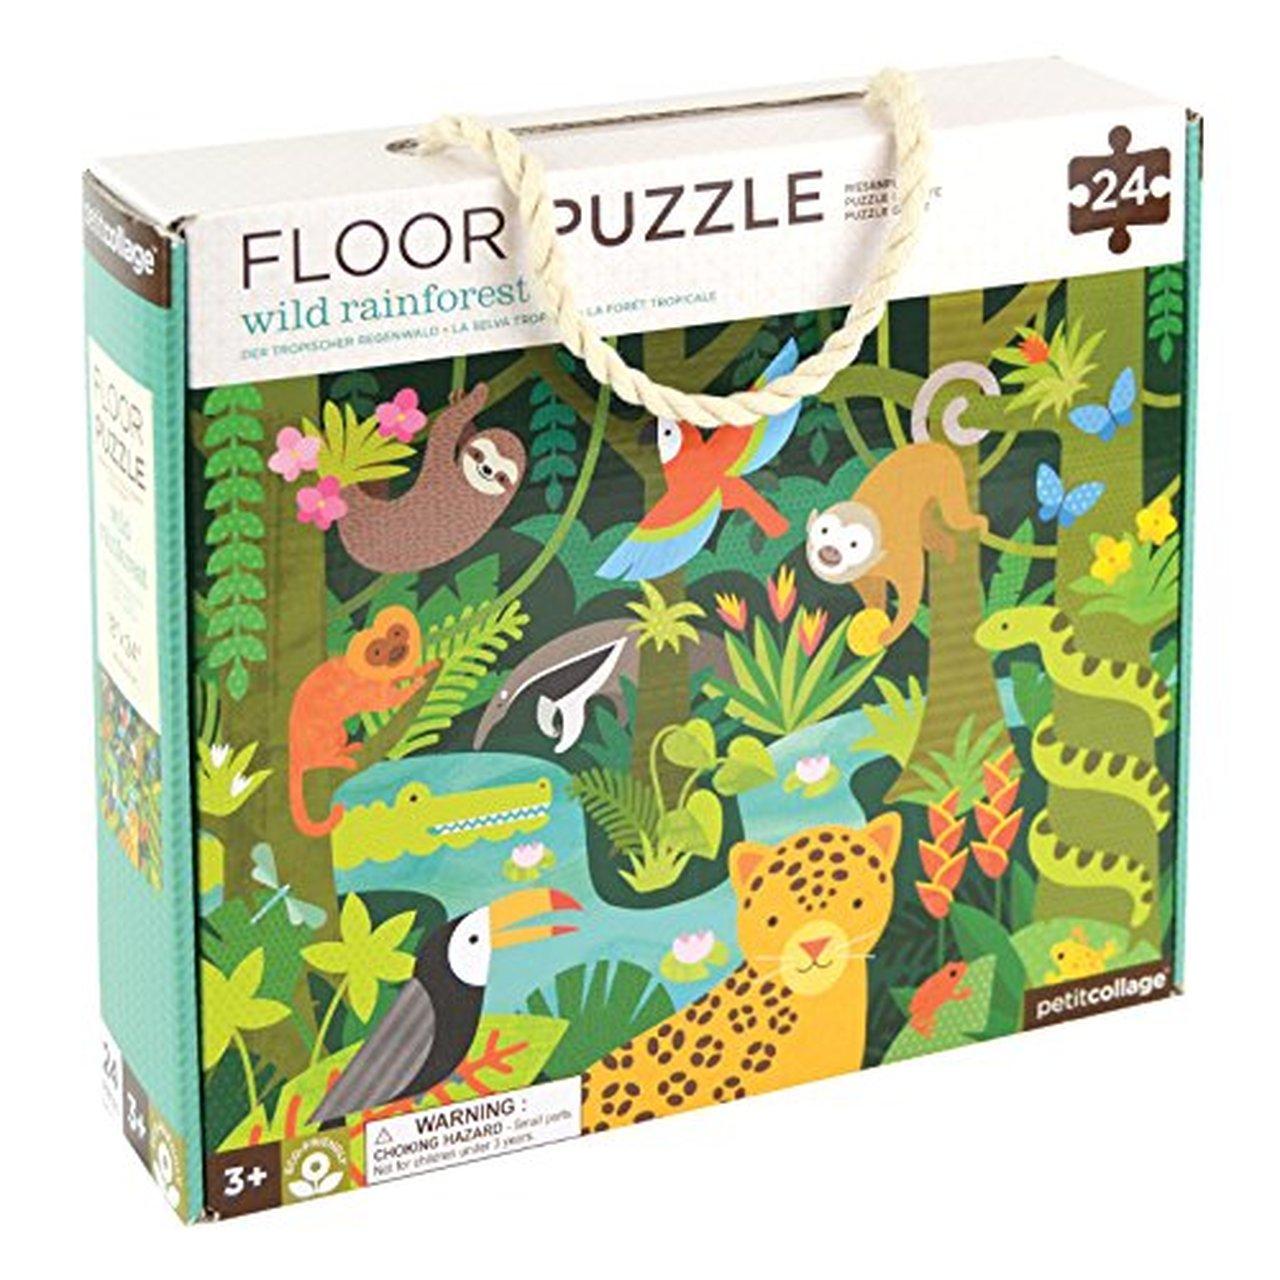 Petit Collage Wild Rainforest 24-Piece Floor Puzzle gimme the good stuff